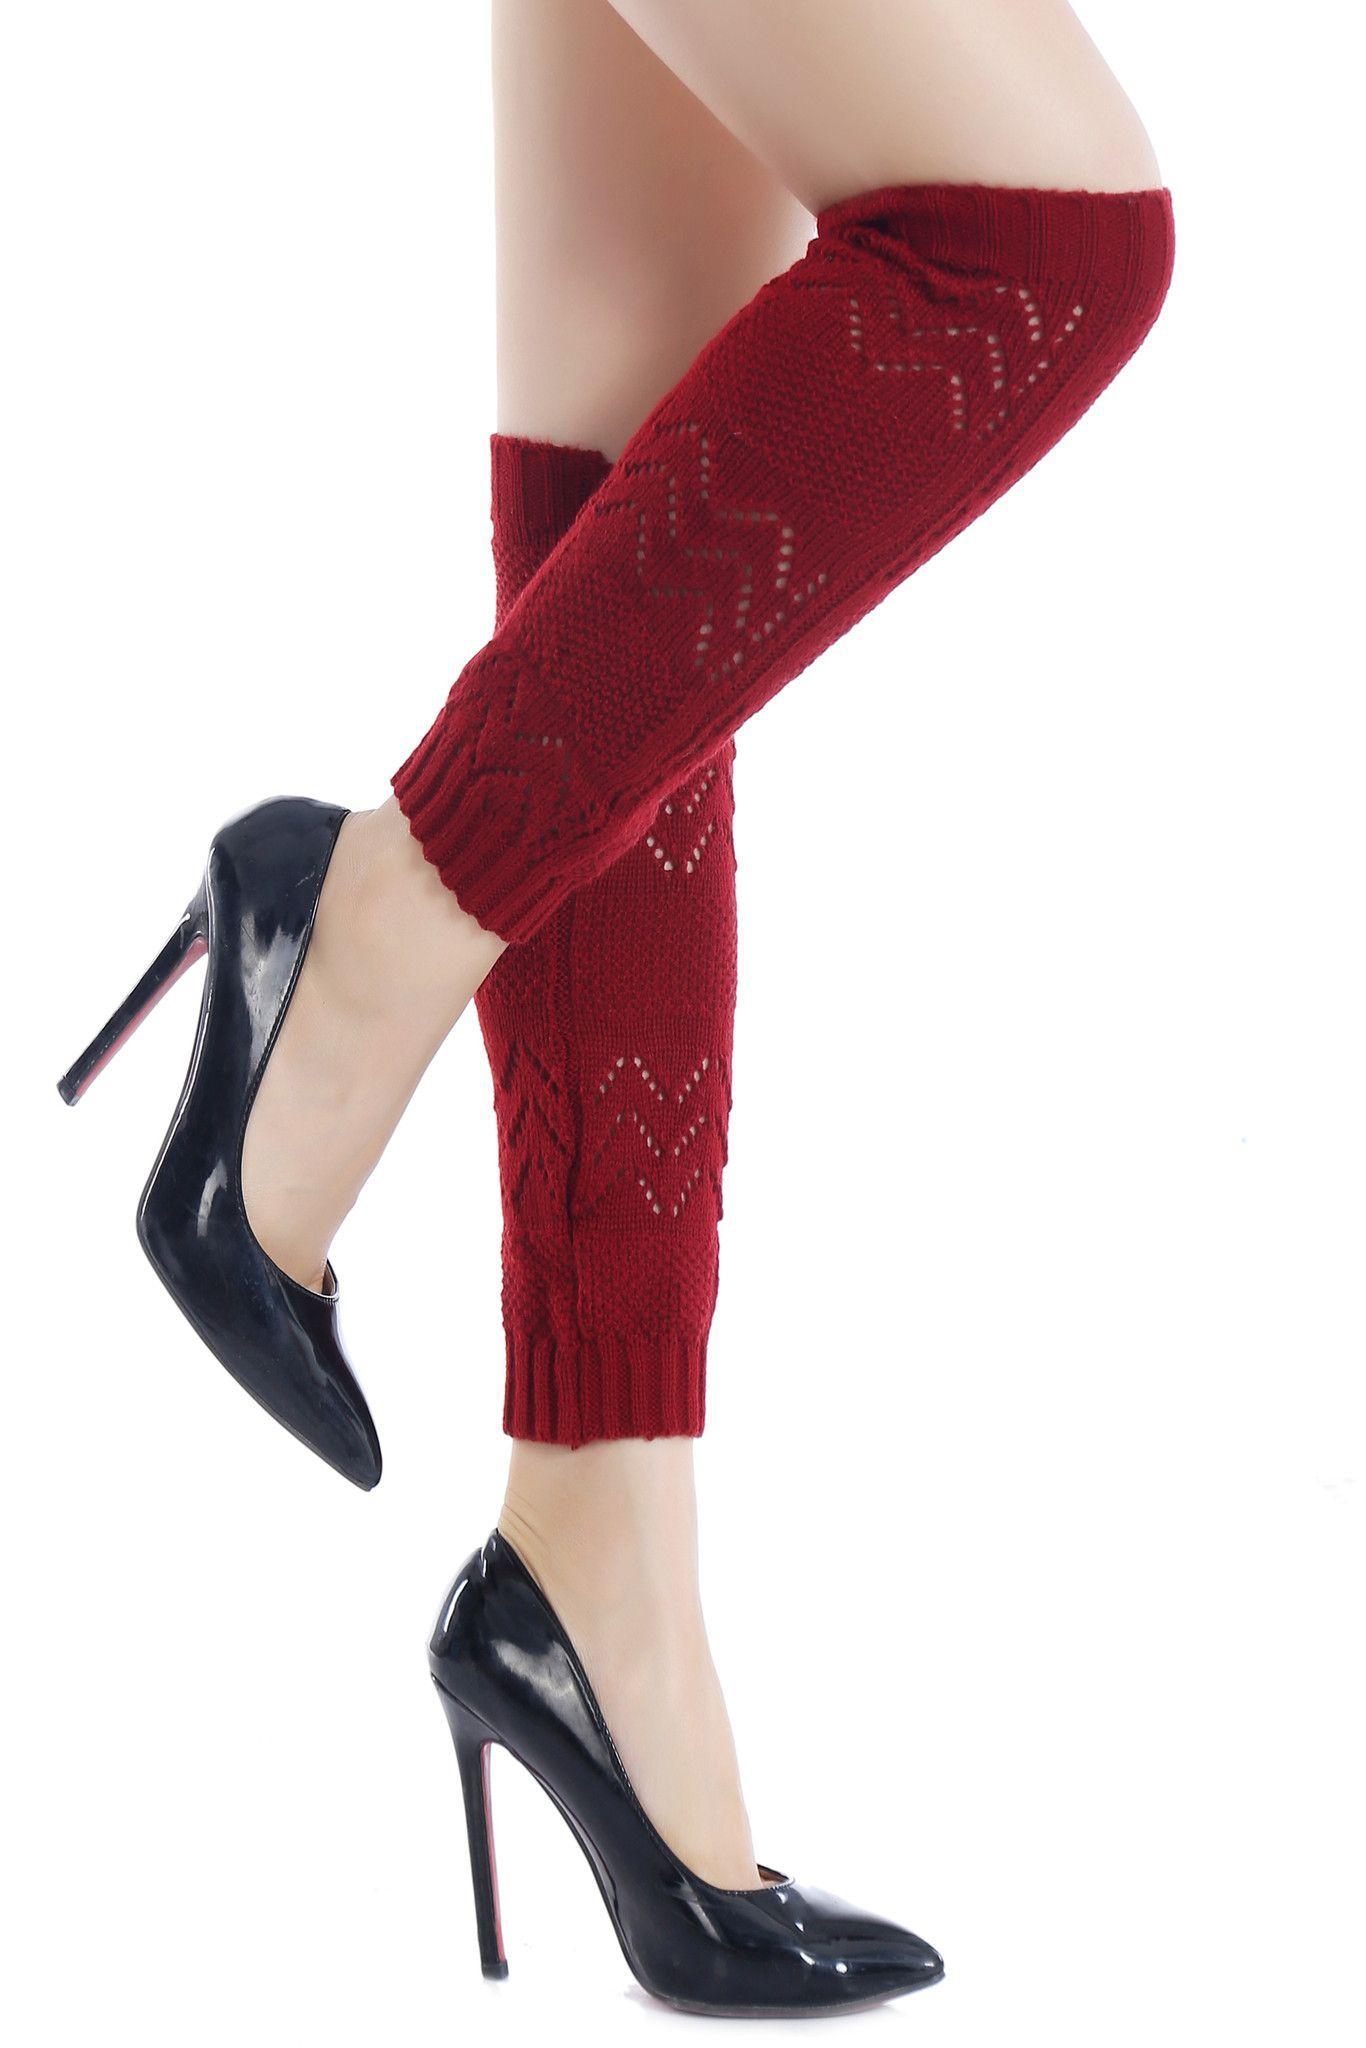 The Chevron Knit Leg Warmer | crochet | Pinterest | Medias, Zapatos ...